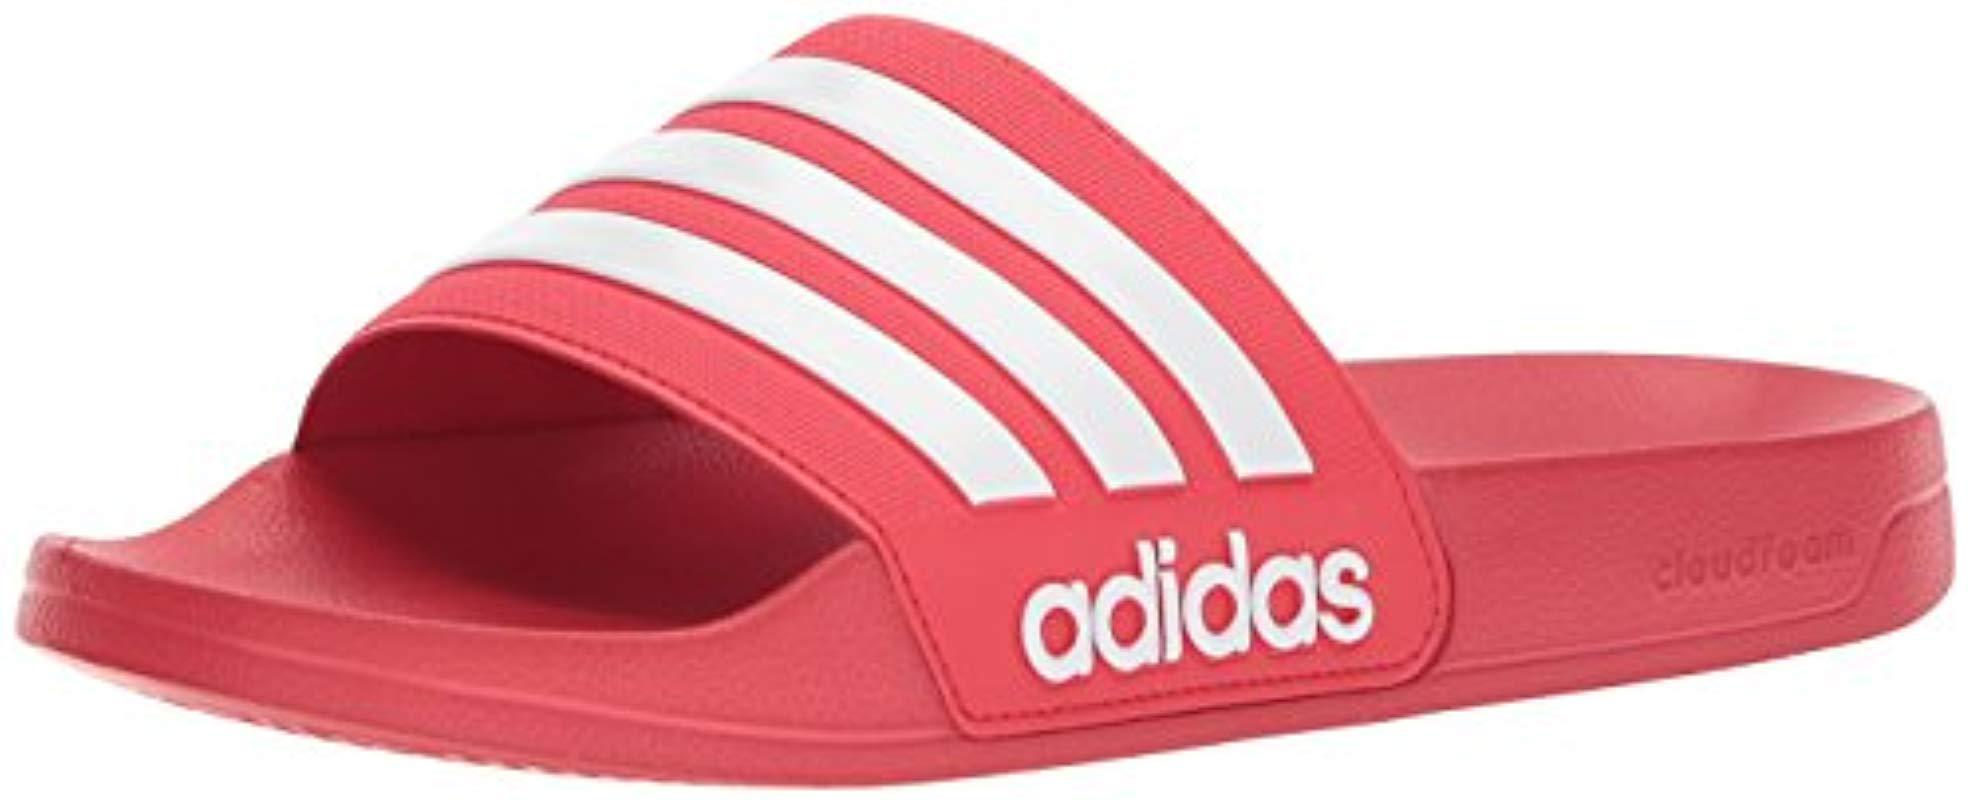 f960530a0436e0 Lyst - adidas Originals Adilette Shower Slide Sandal in Red for Men